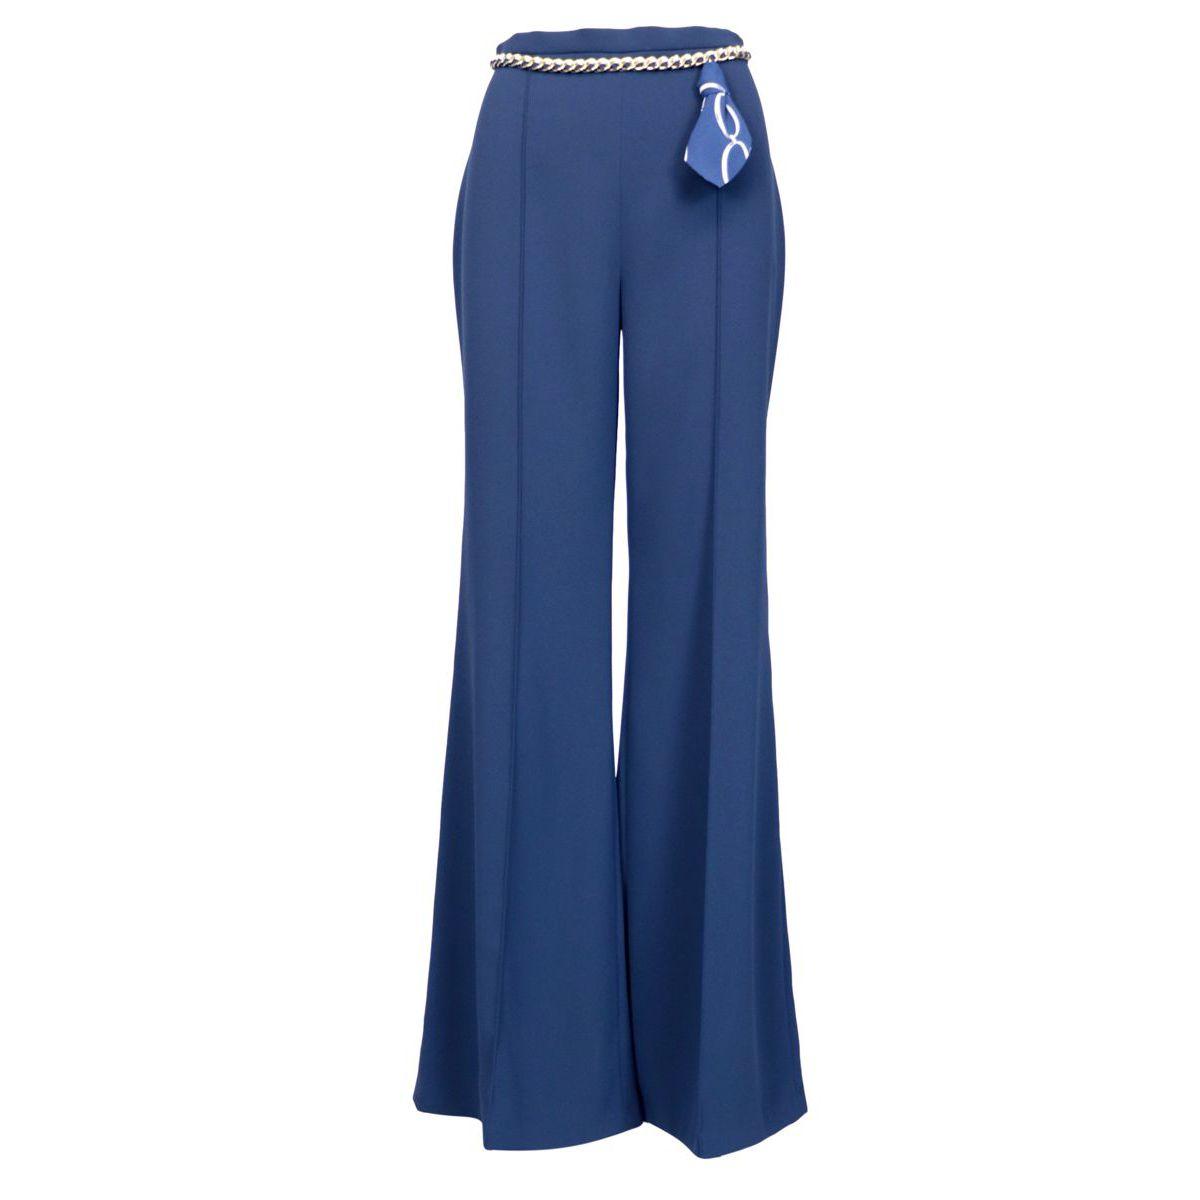 Pantalone in crepe modello palazzo Blu/navy Elisabetta Franchi